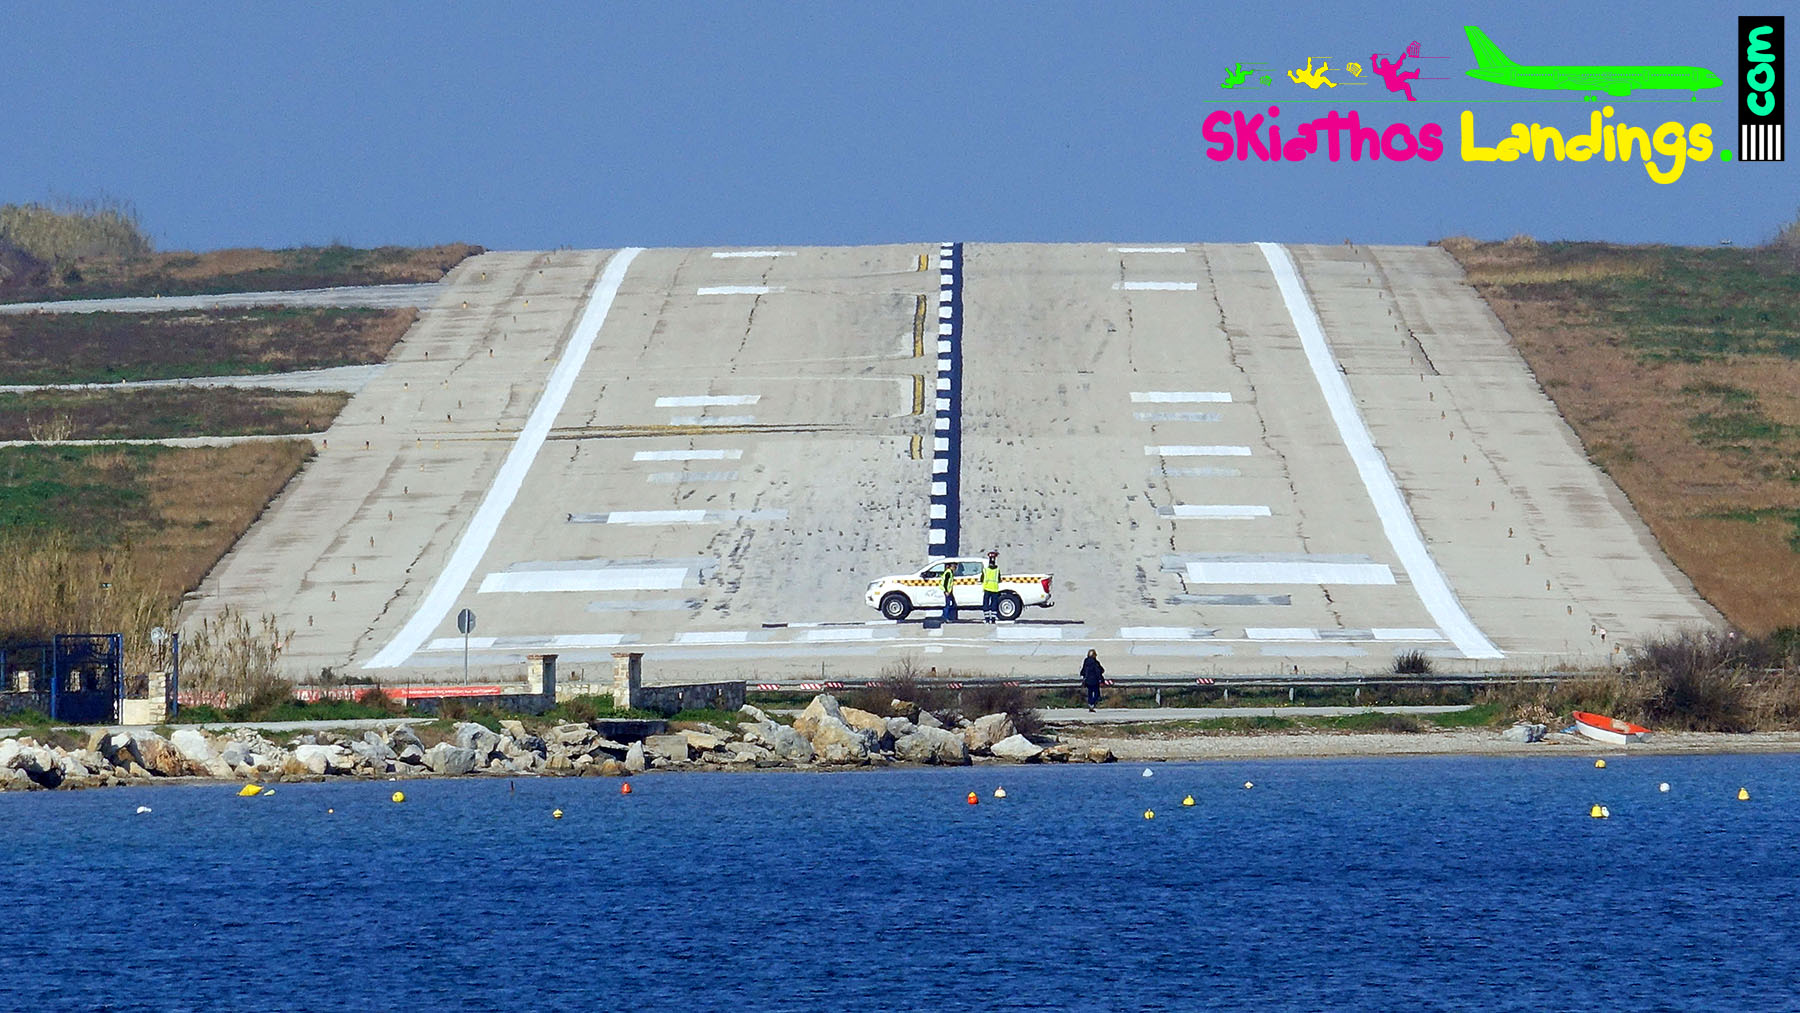 Skiathos airport runway designators change